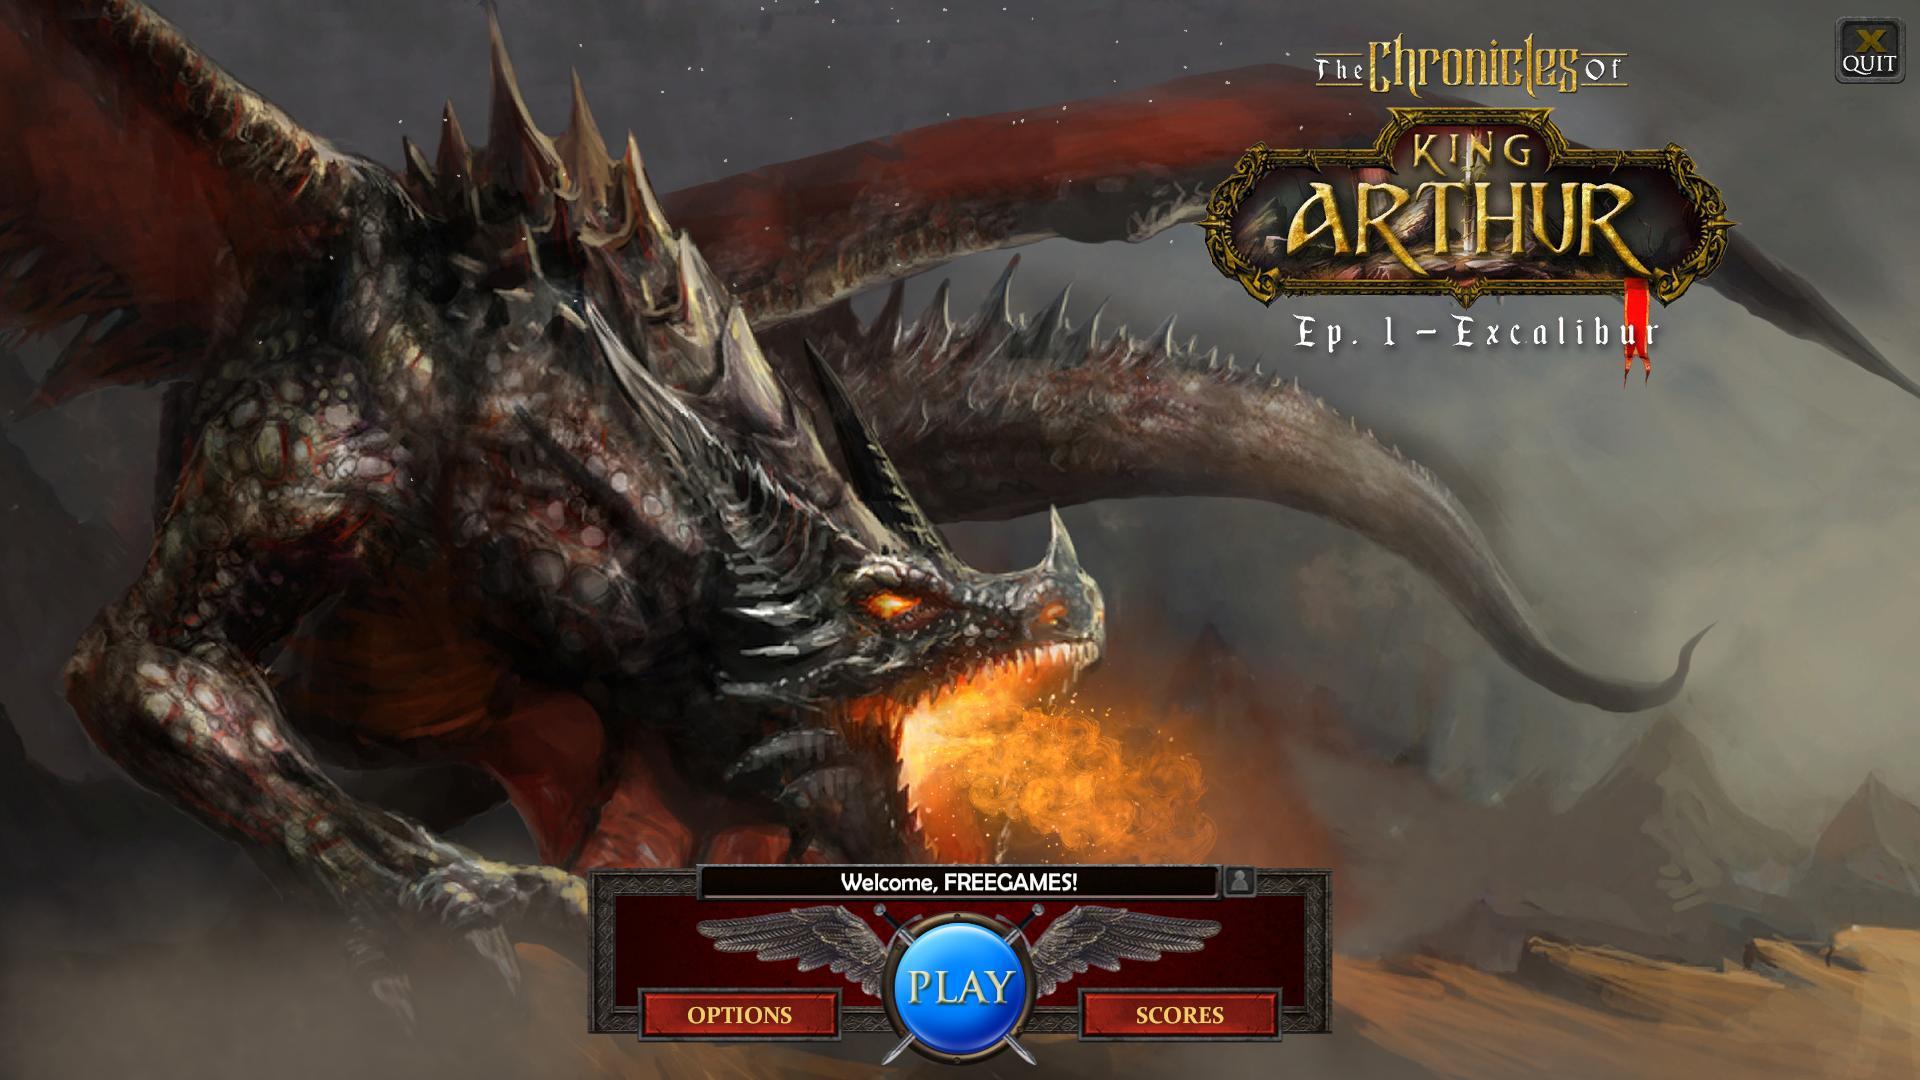 Хроники короля Артура Эпизод 1: Экскалибур | The Chronicles of King Arthur Episode 1: Excalibur (En)